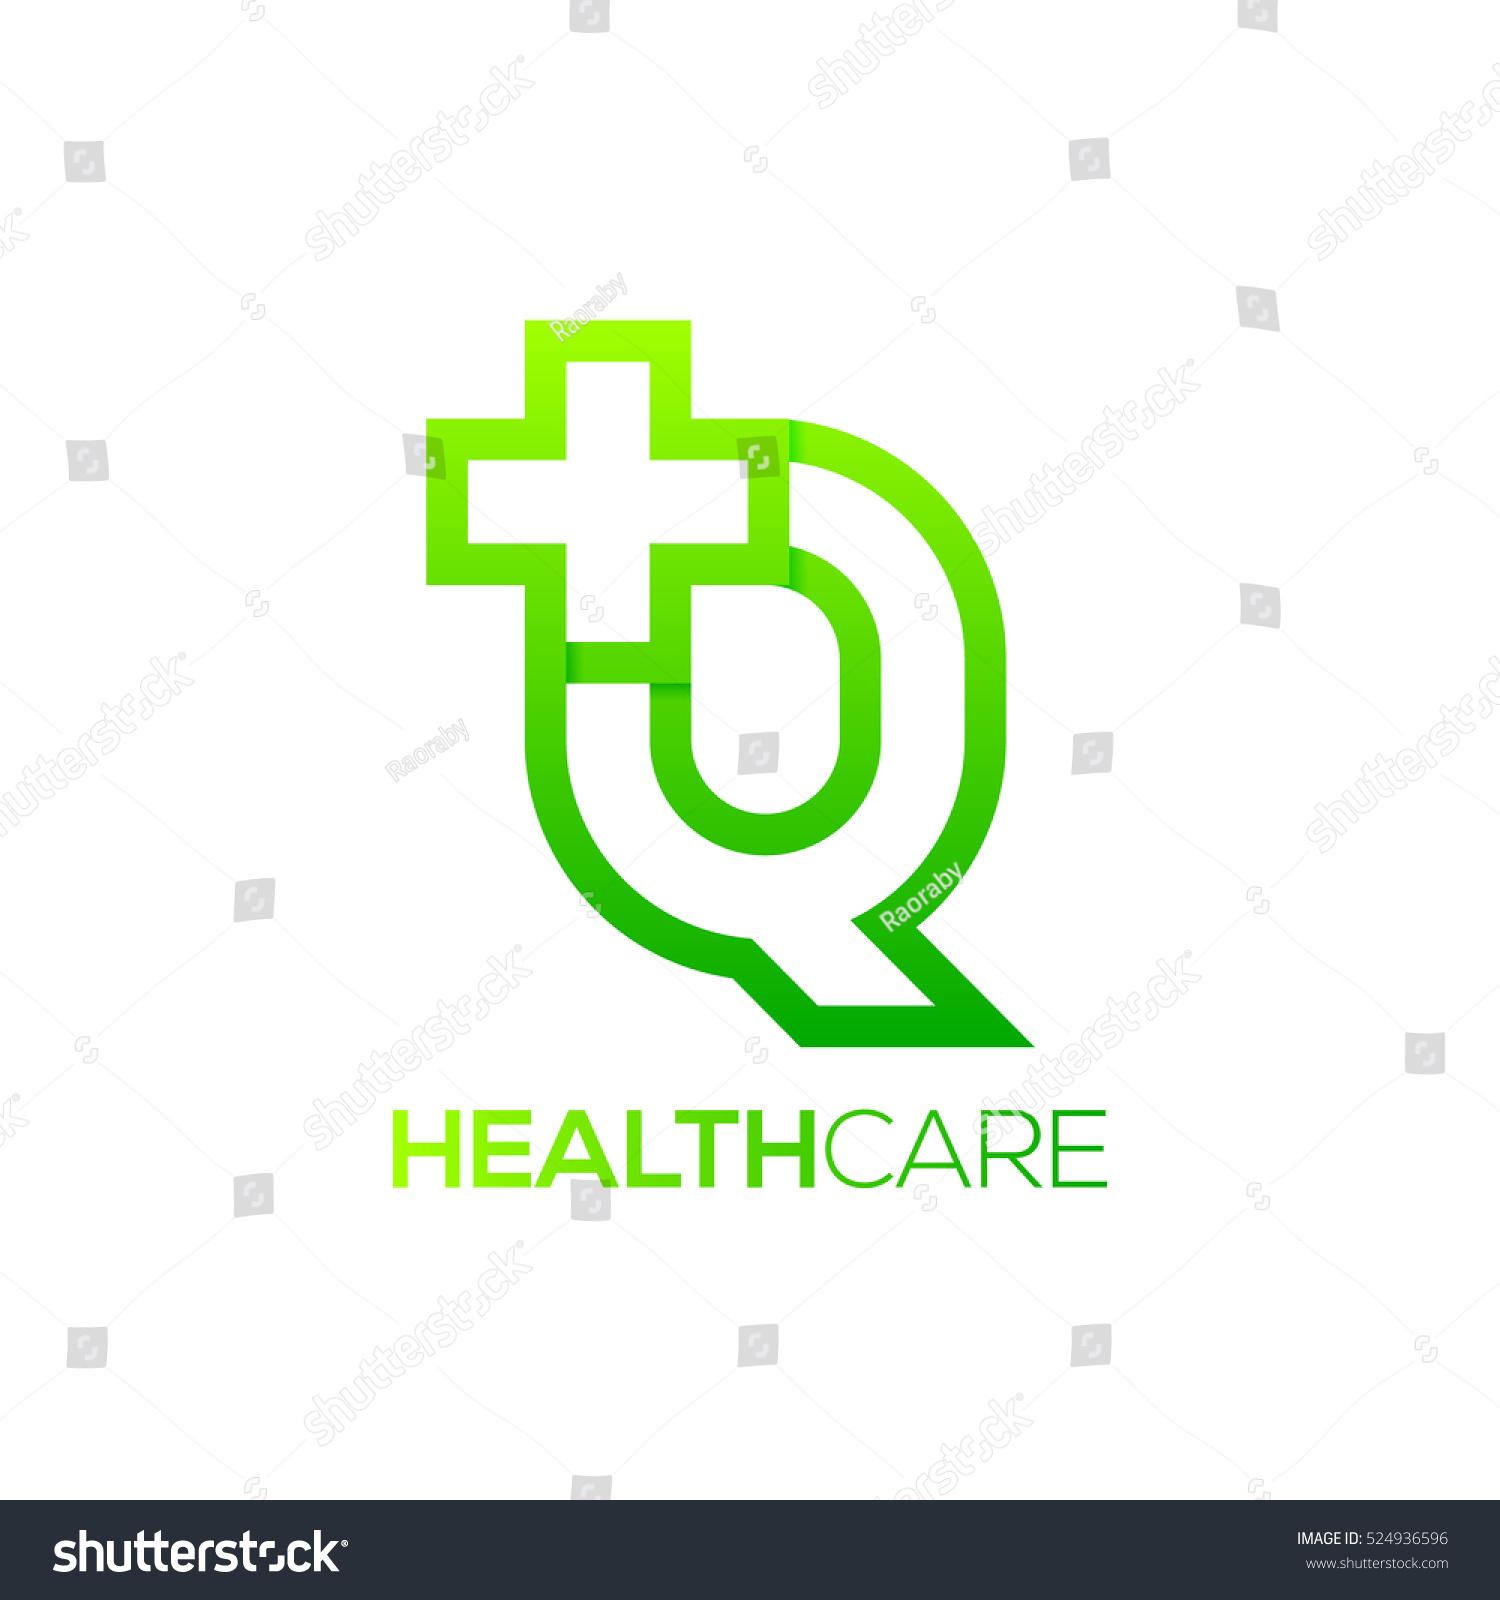 Letter Q cross plus logo Green color,Medical healthcare hospital Logotype